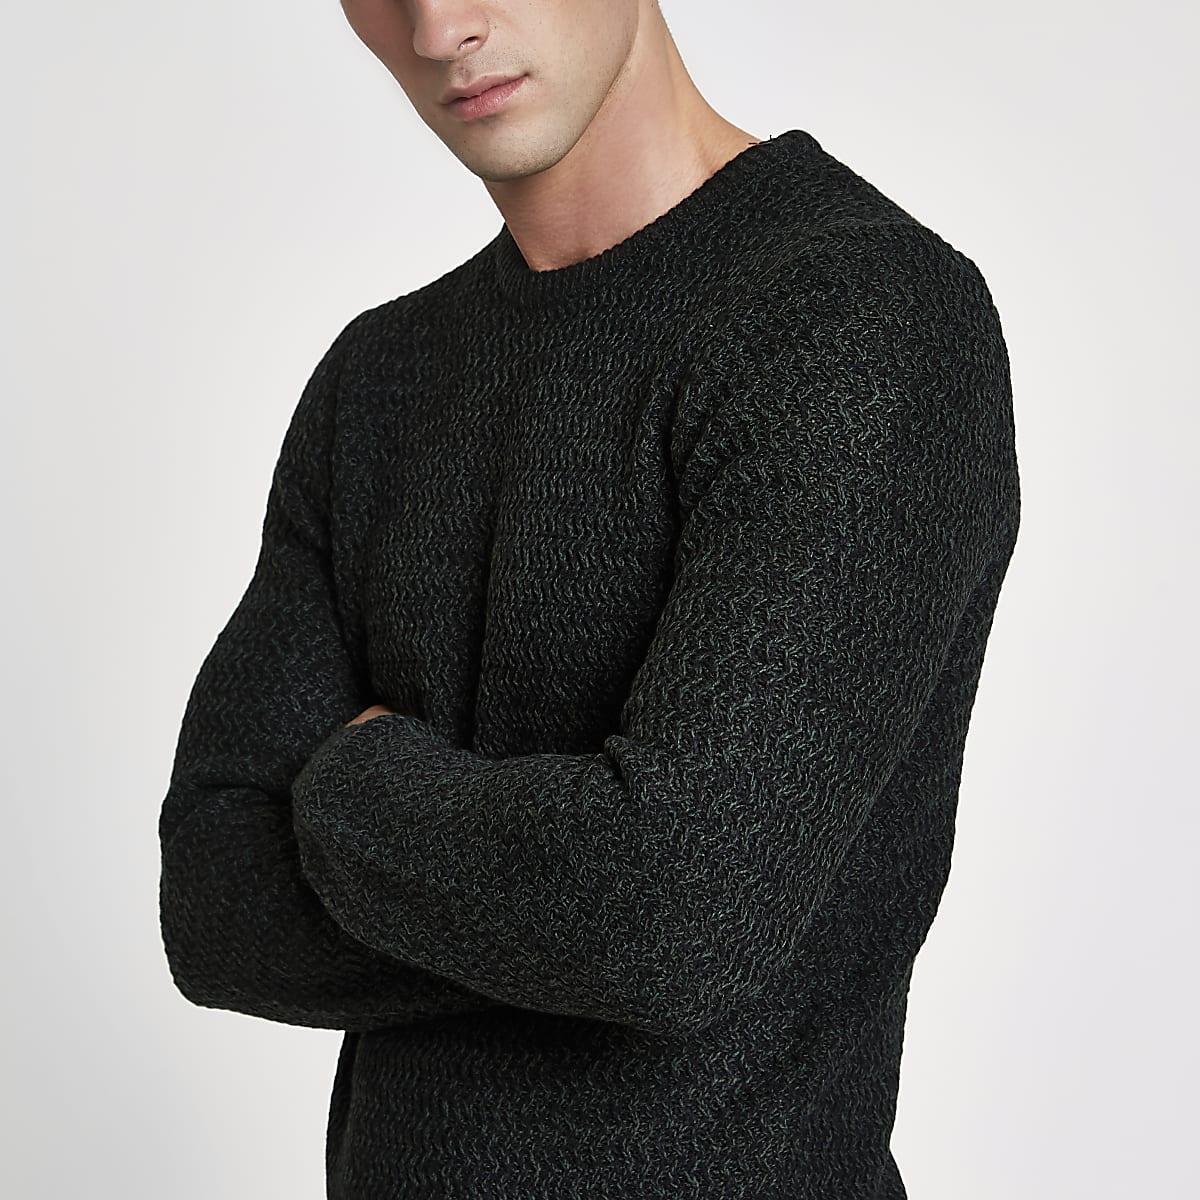 Green knit slim fit crew neck sweater